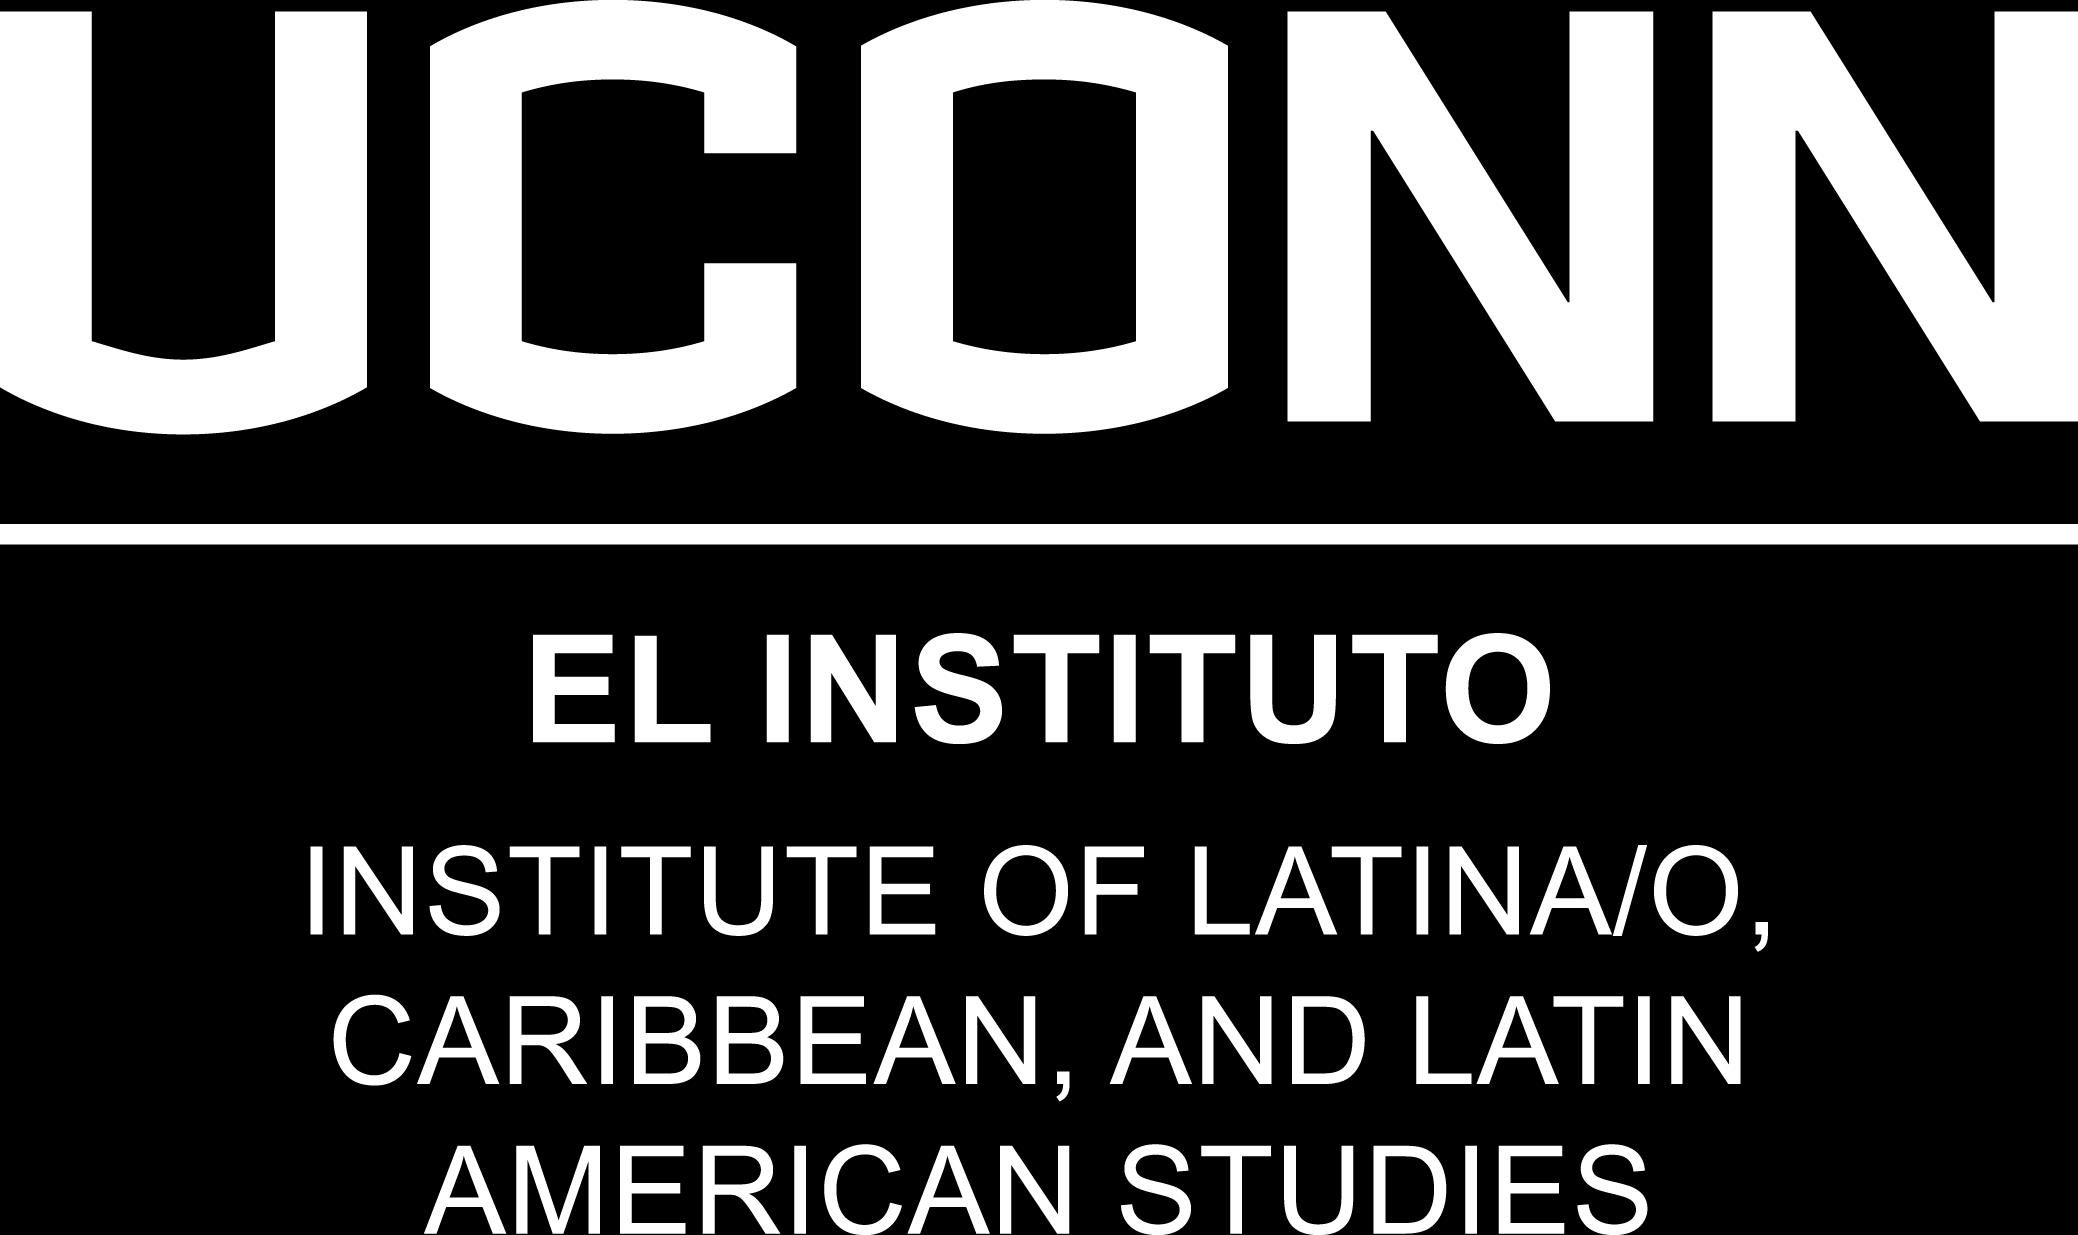 ELIN new logo